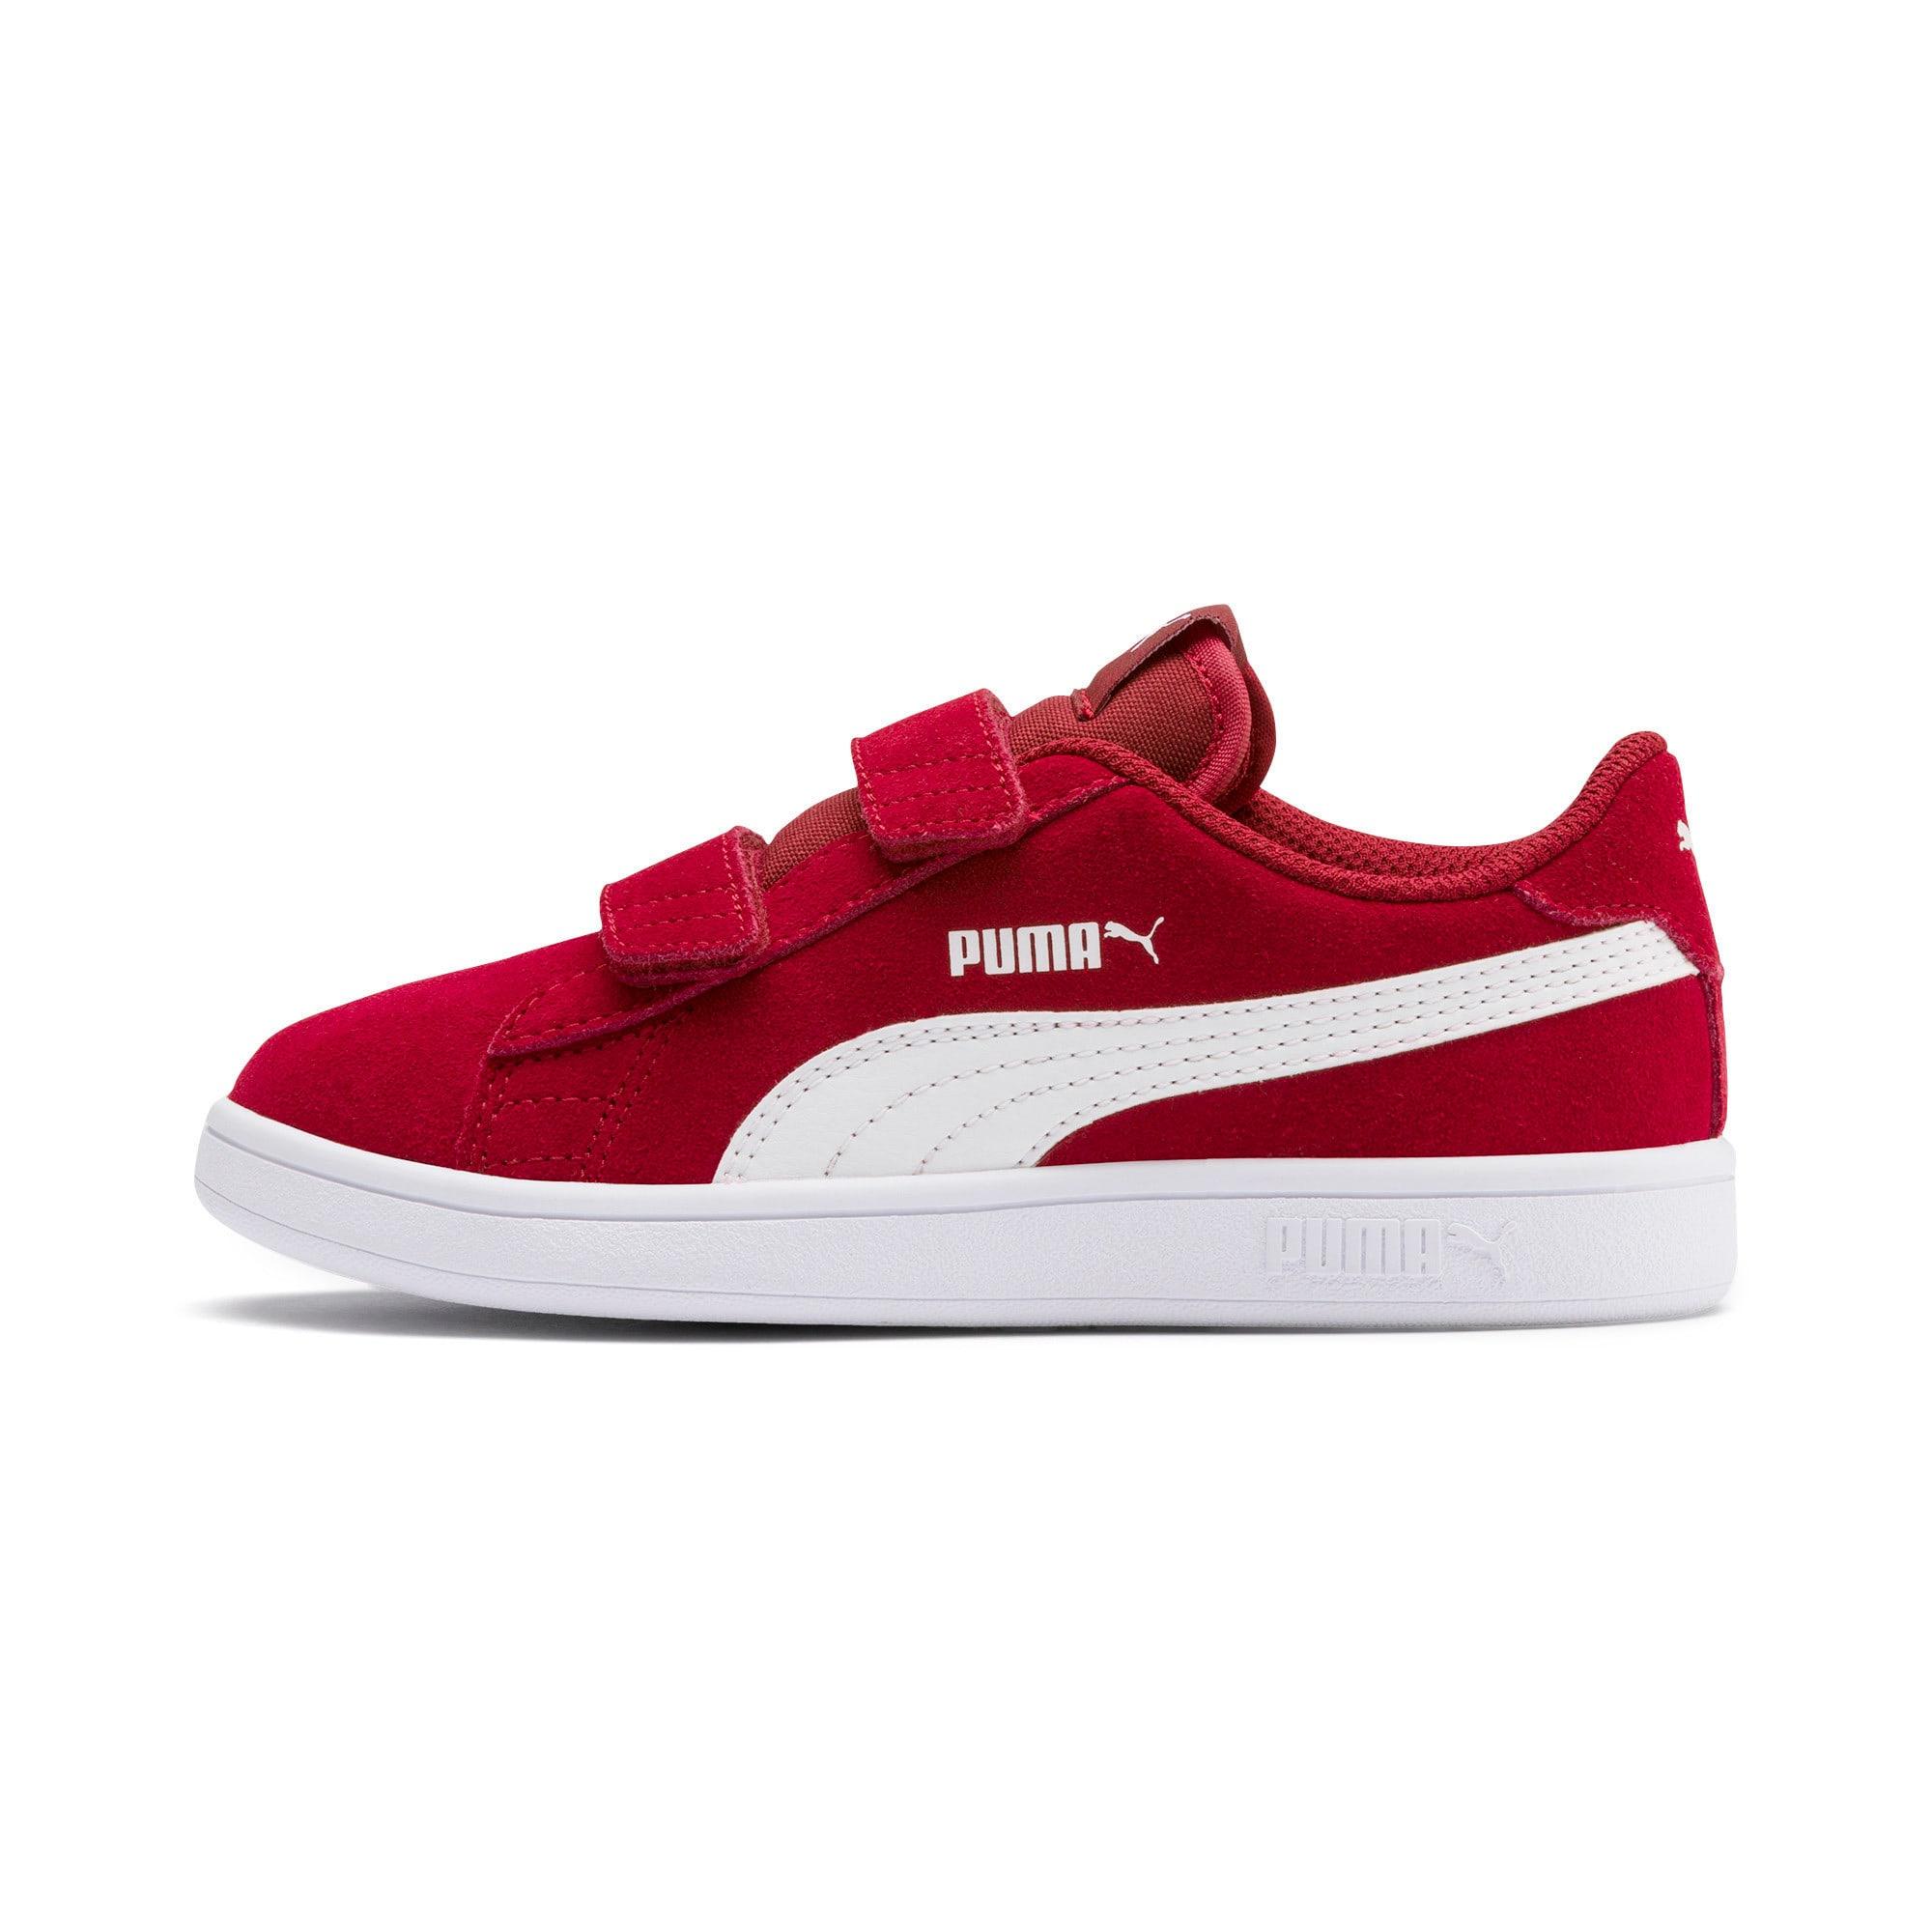 Thumbnail 1 of Smash v2 Suede Little Kids' Shoes, Rhubarb-Puma White, medium